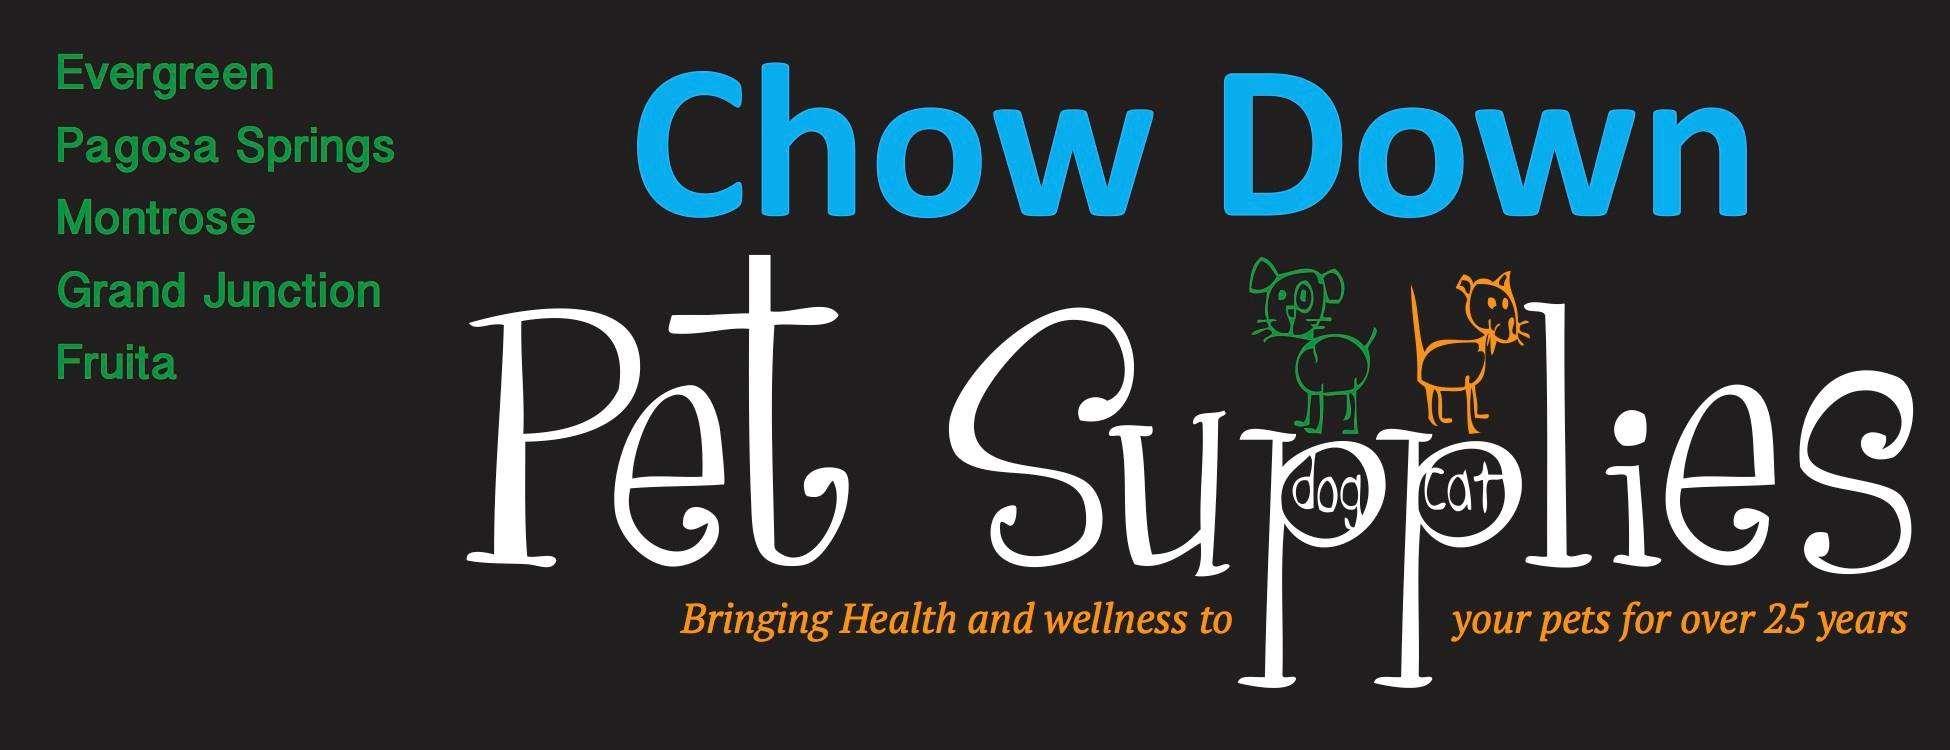 Chow Down